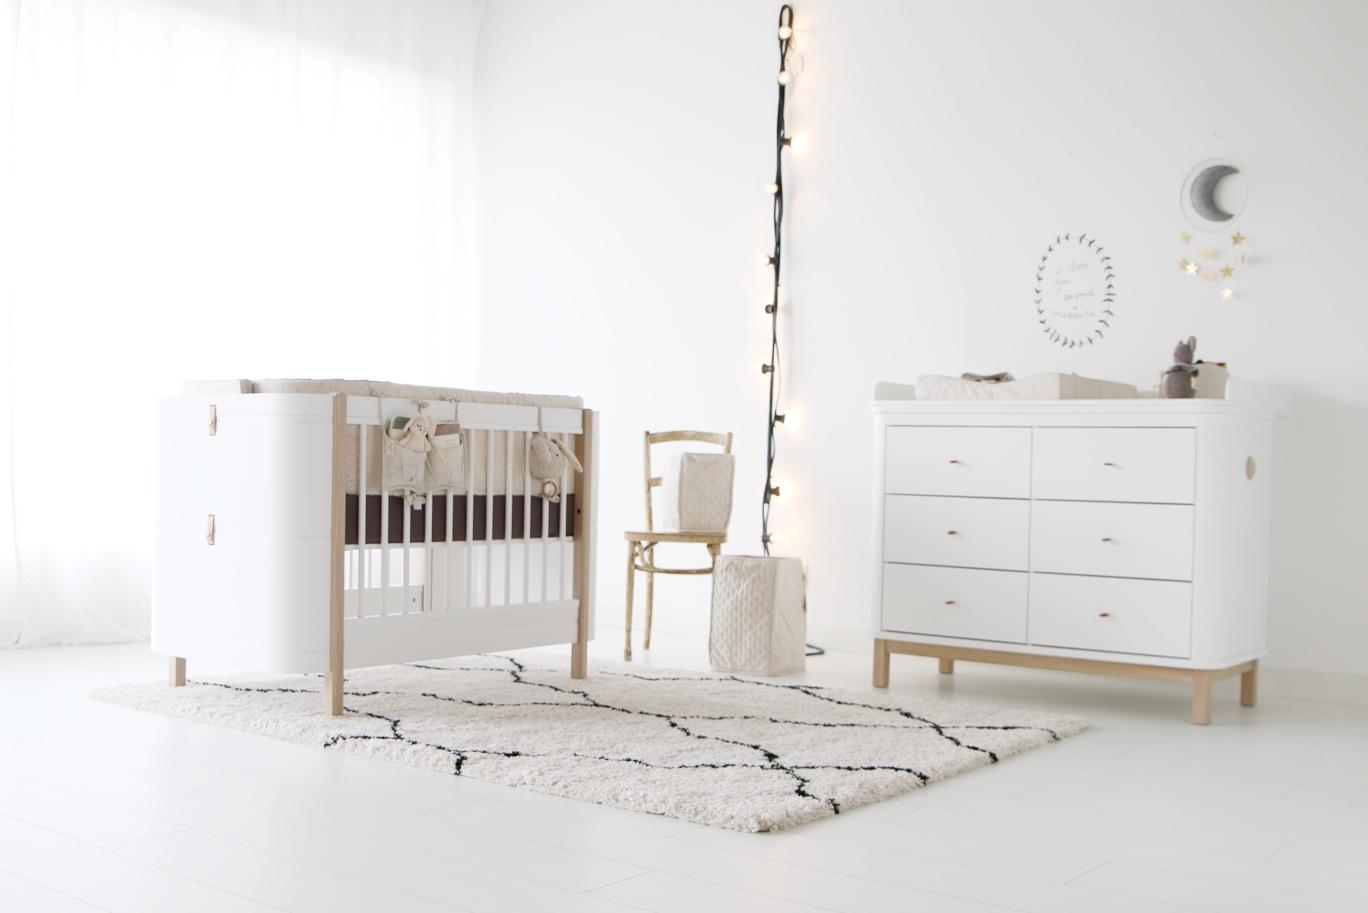 mini furniture. CozyKidz Blog Oliver Furniture Mini + R